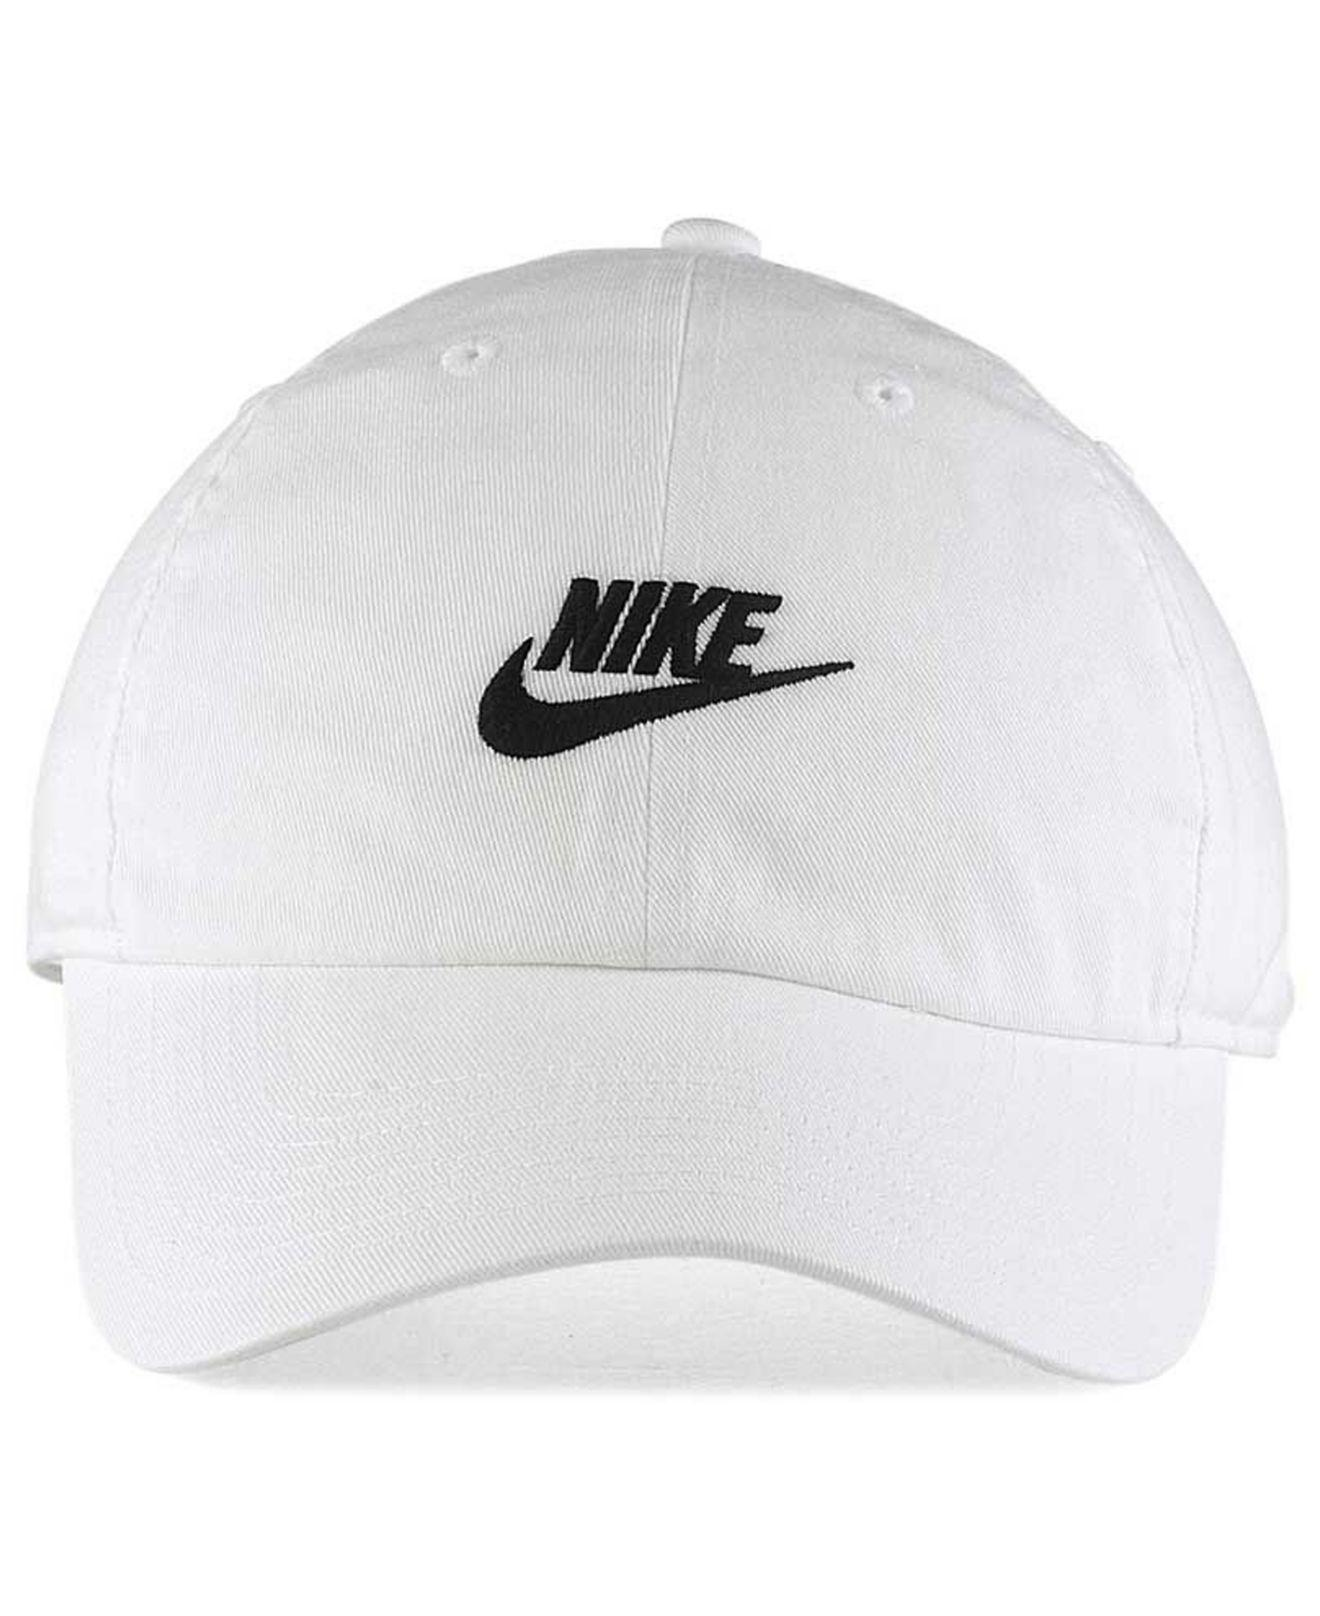 68198b65152 Lyst - Nike Futura Heritage 2.0 Cap in White